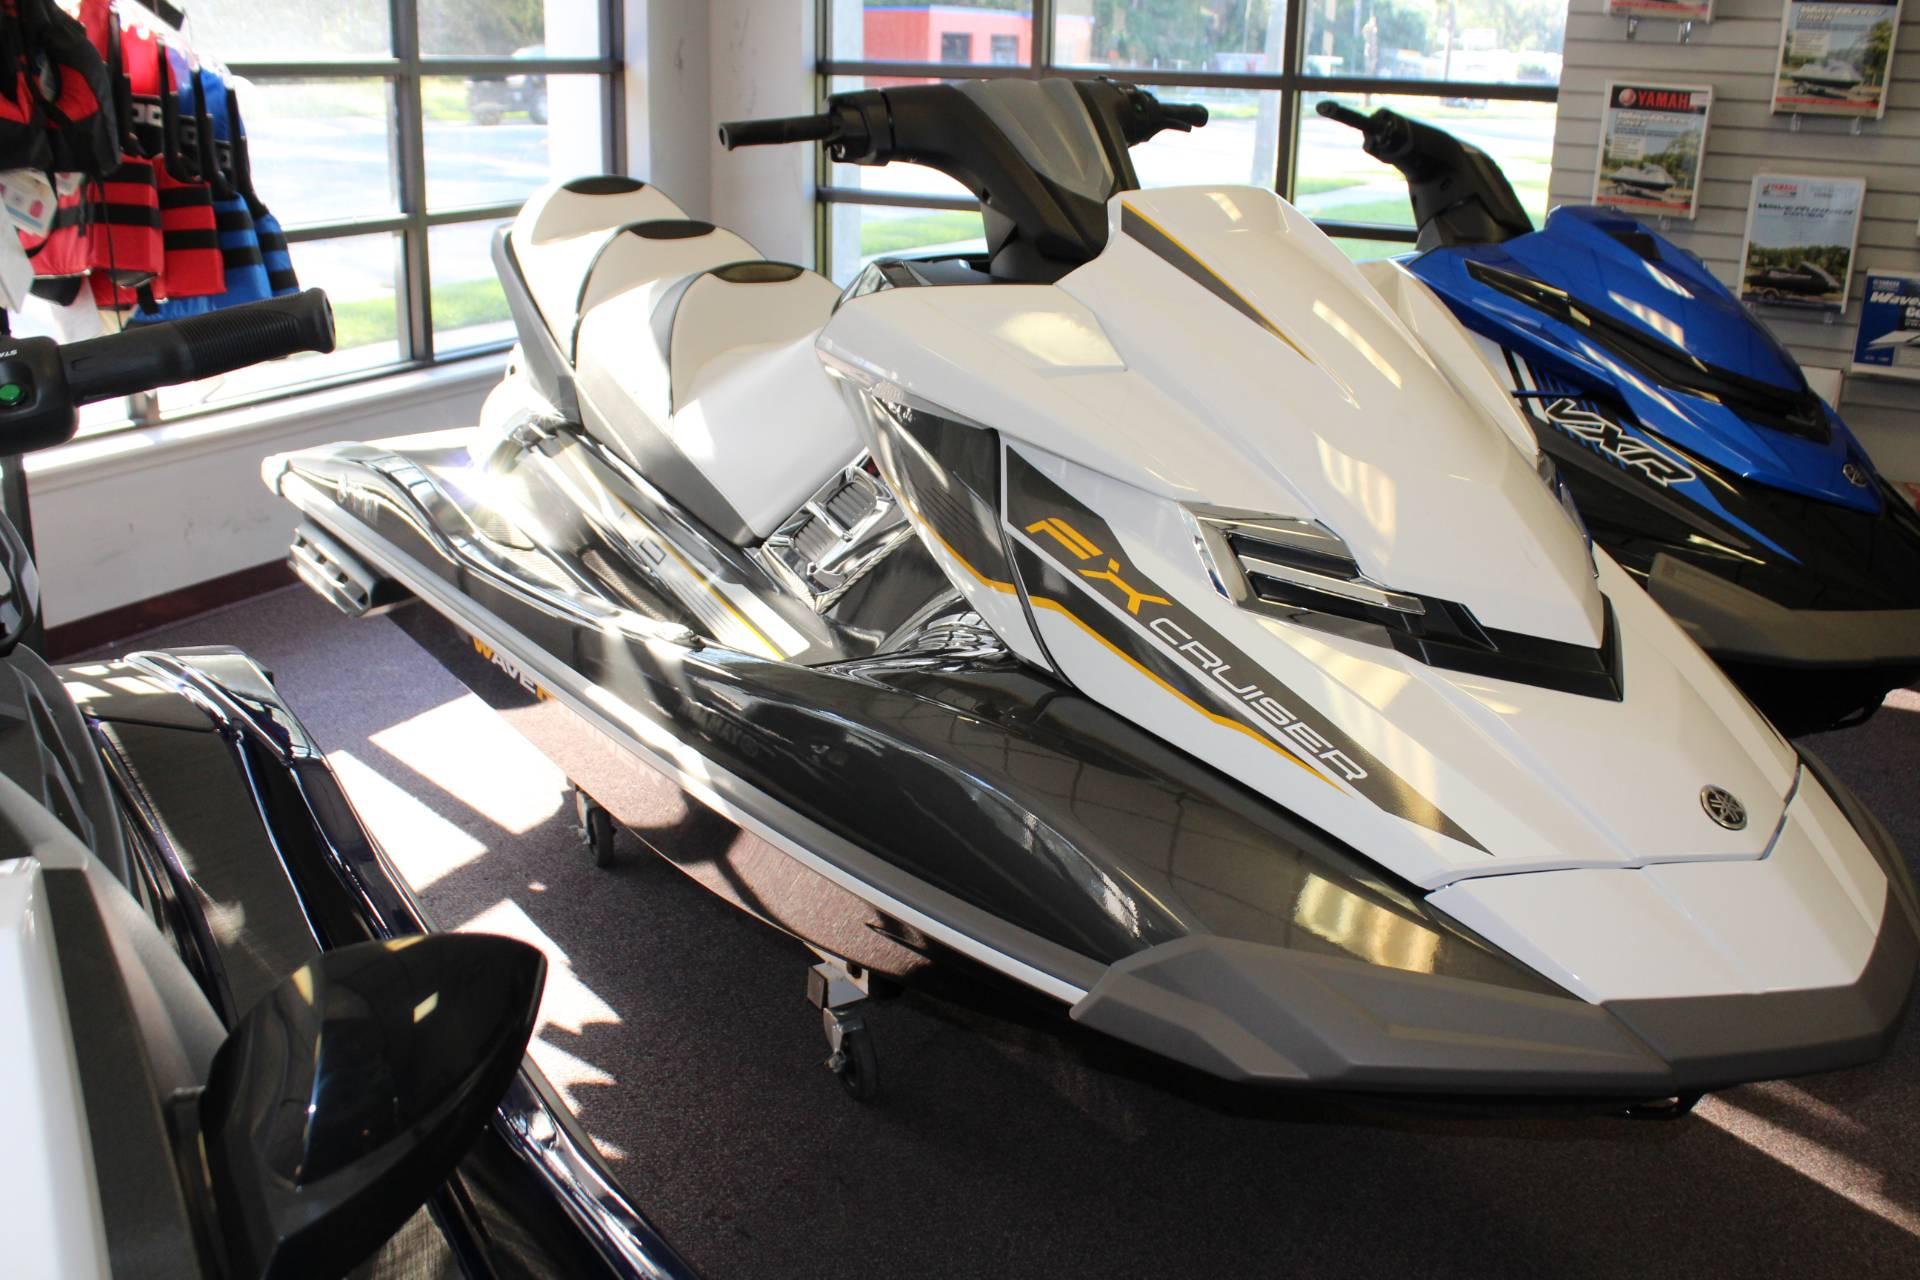 2018 yamaha fx cruiser ho watercraft palatka florida n a for Yamaha fx cruiser